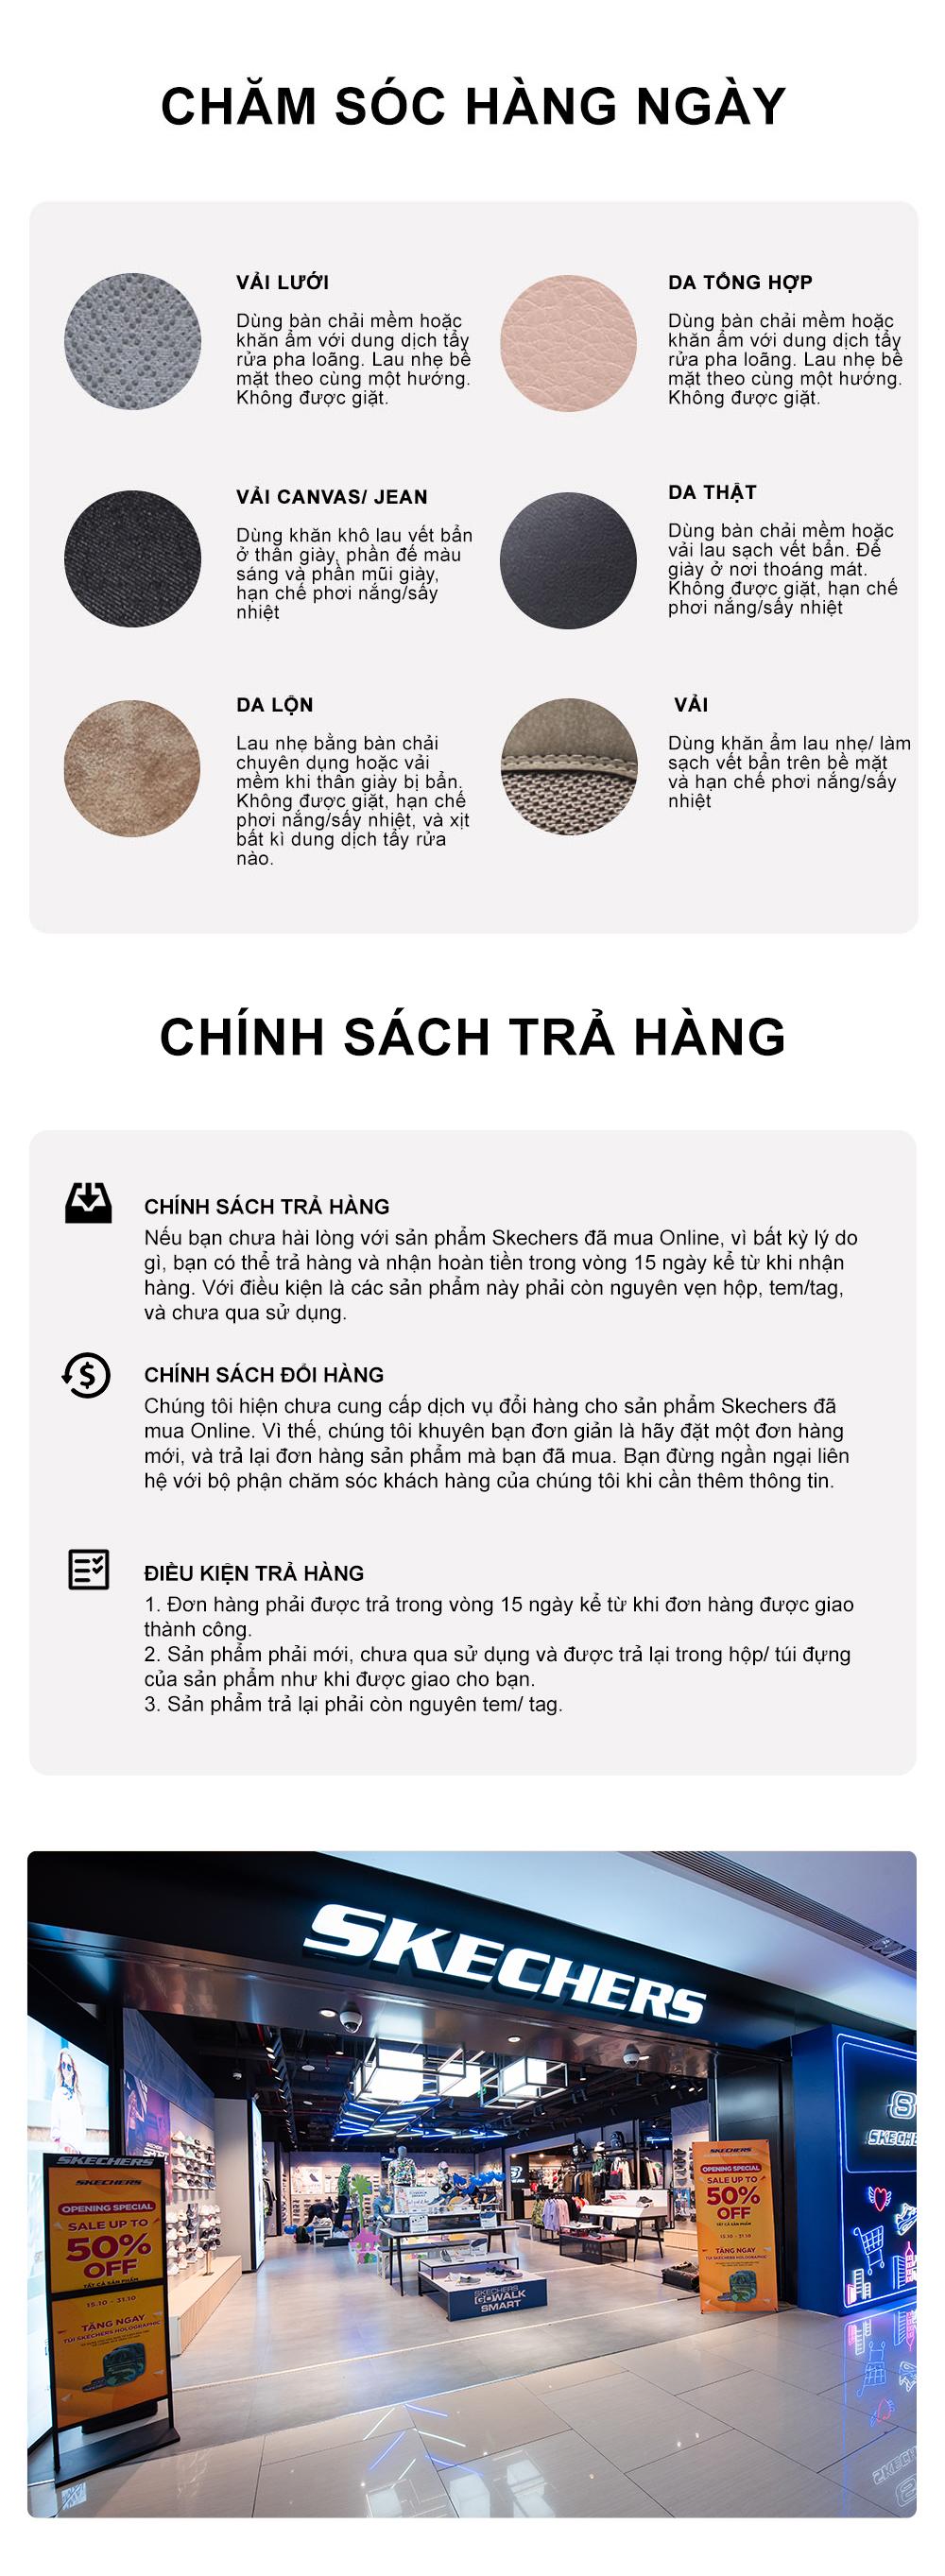 Skechers Nam Giày Thể Thao Drafter Sport - 52945-GYBK 2